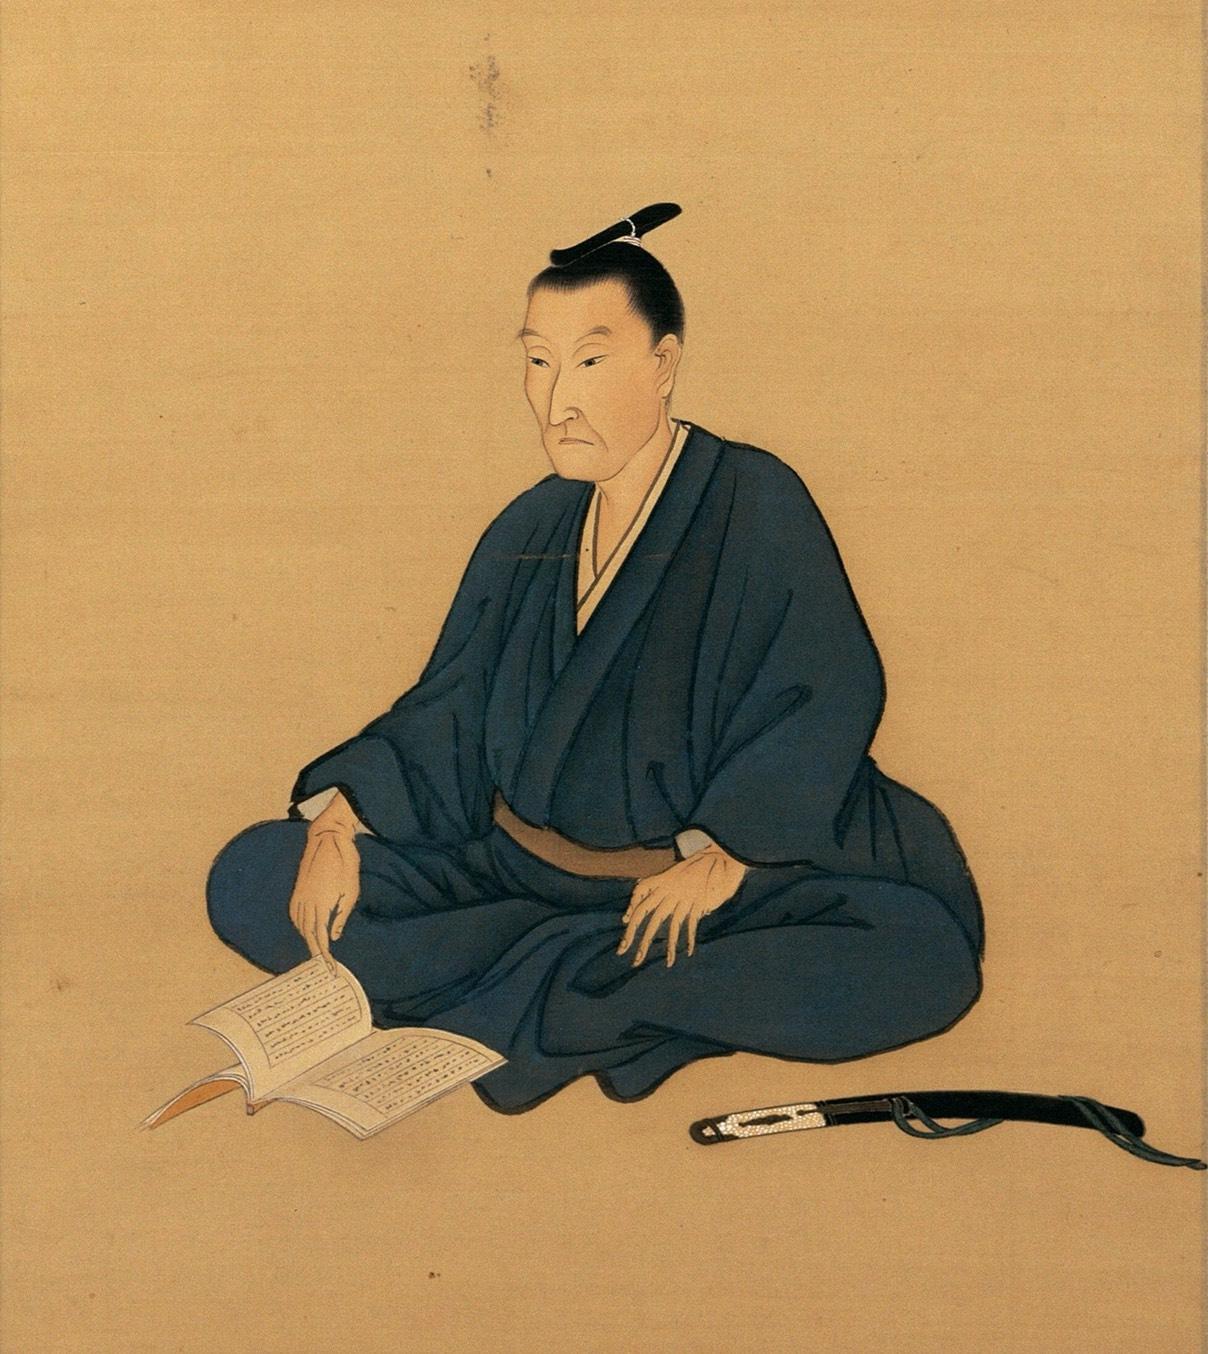 吉田松陰先生の画像